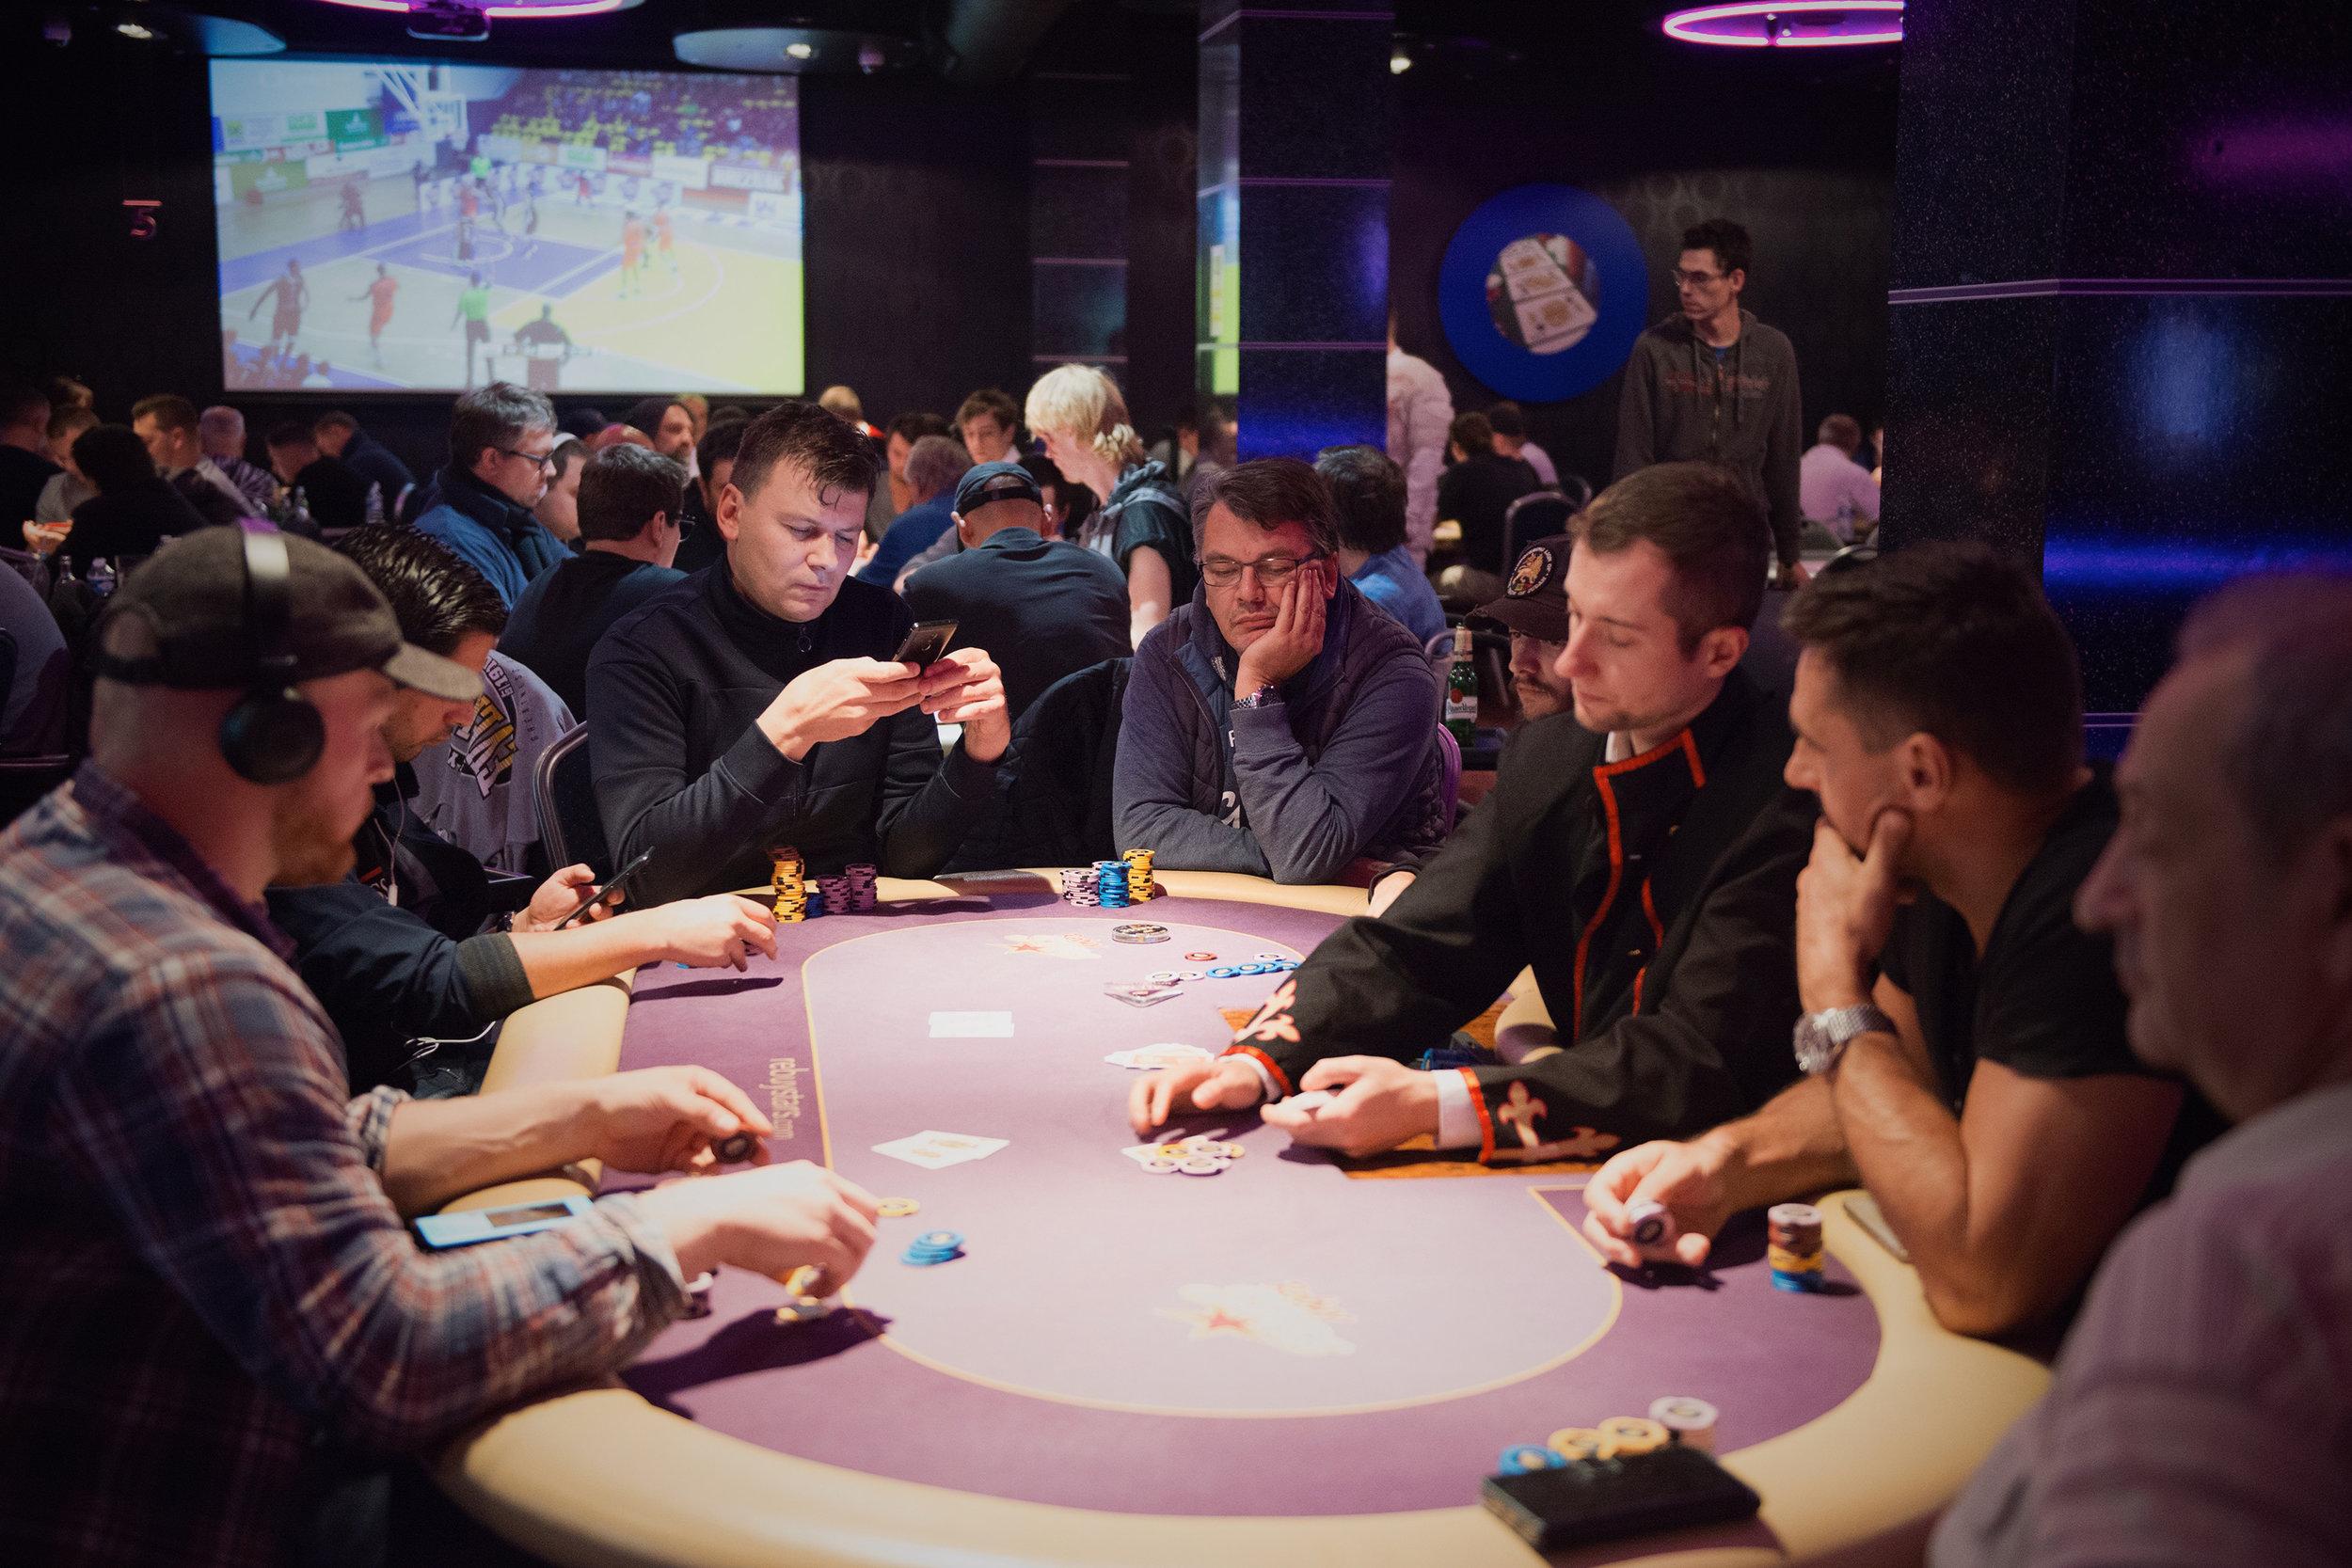 Poker-Photography-Europe-Polina-Shubkina-Casino-RebuyStars-015.JPG